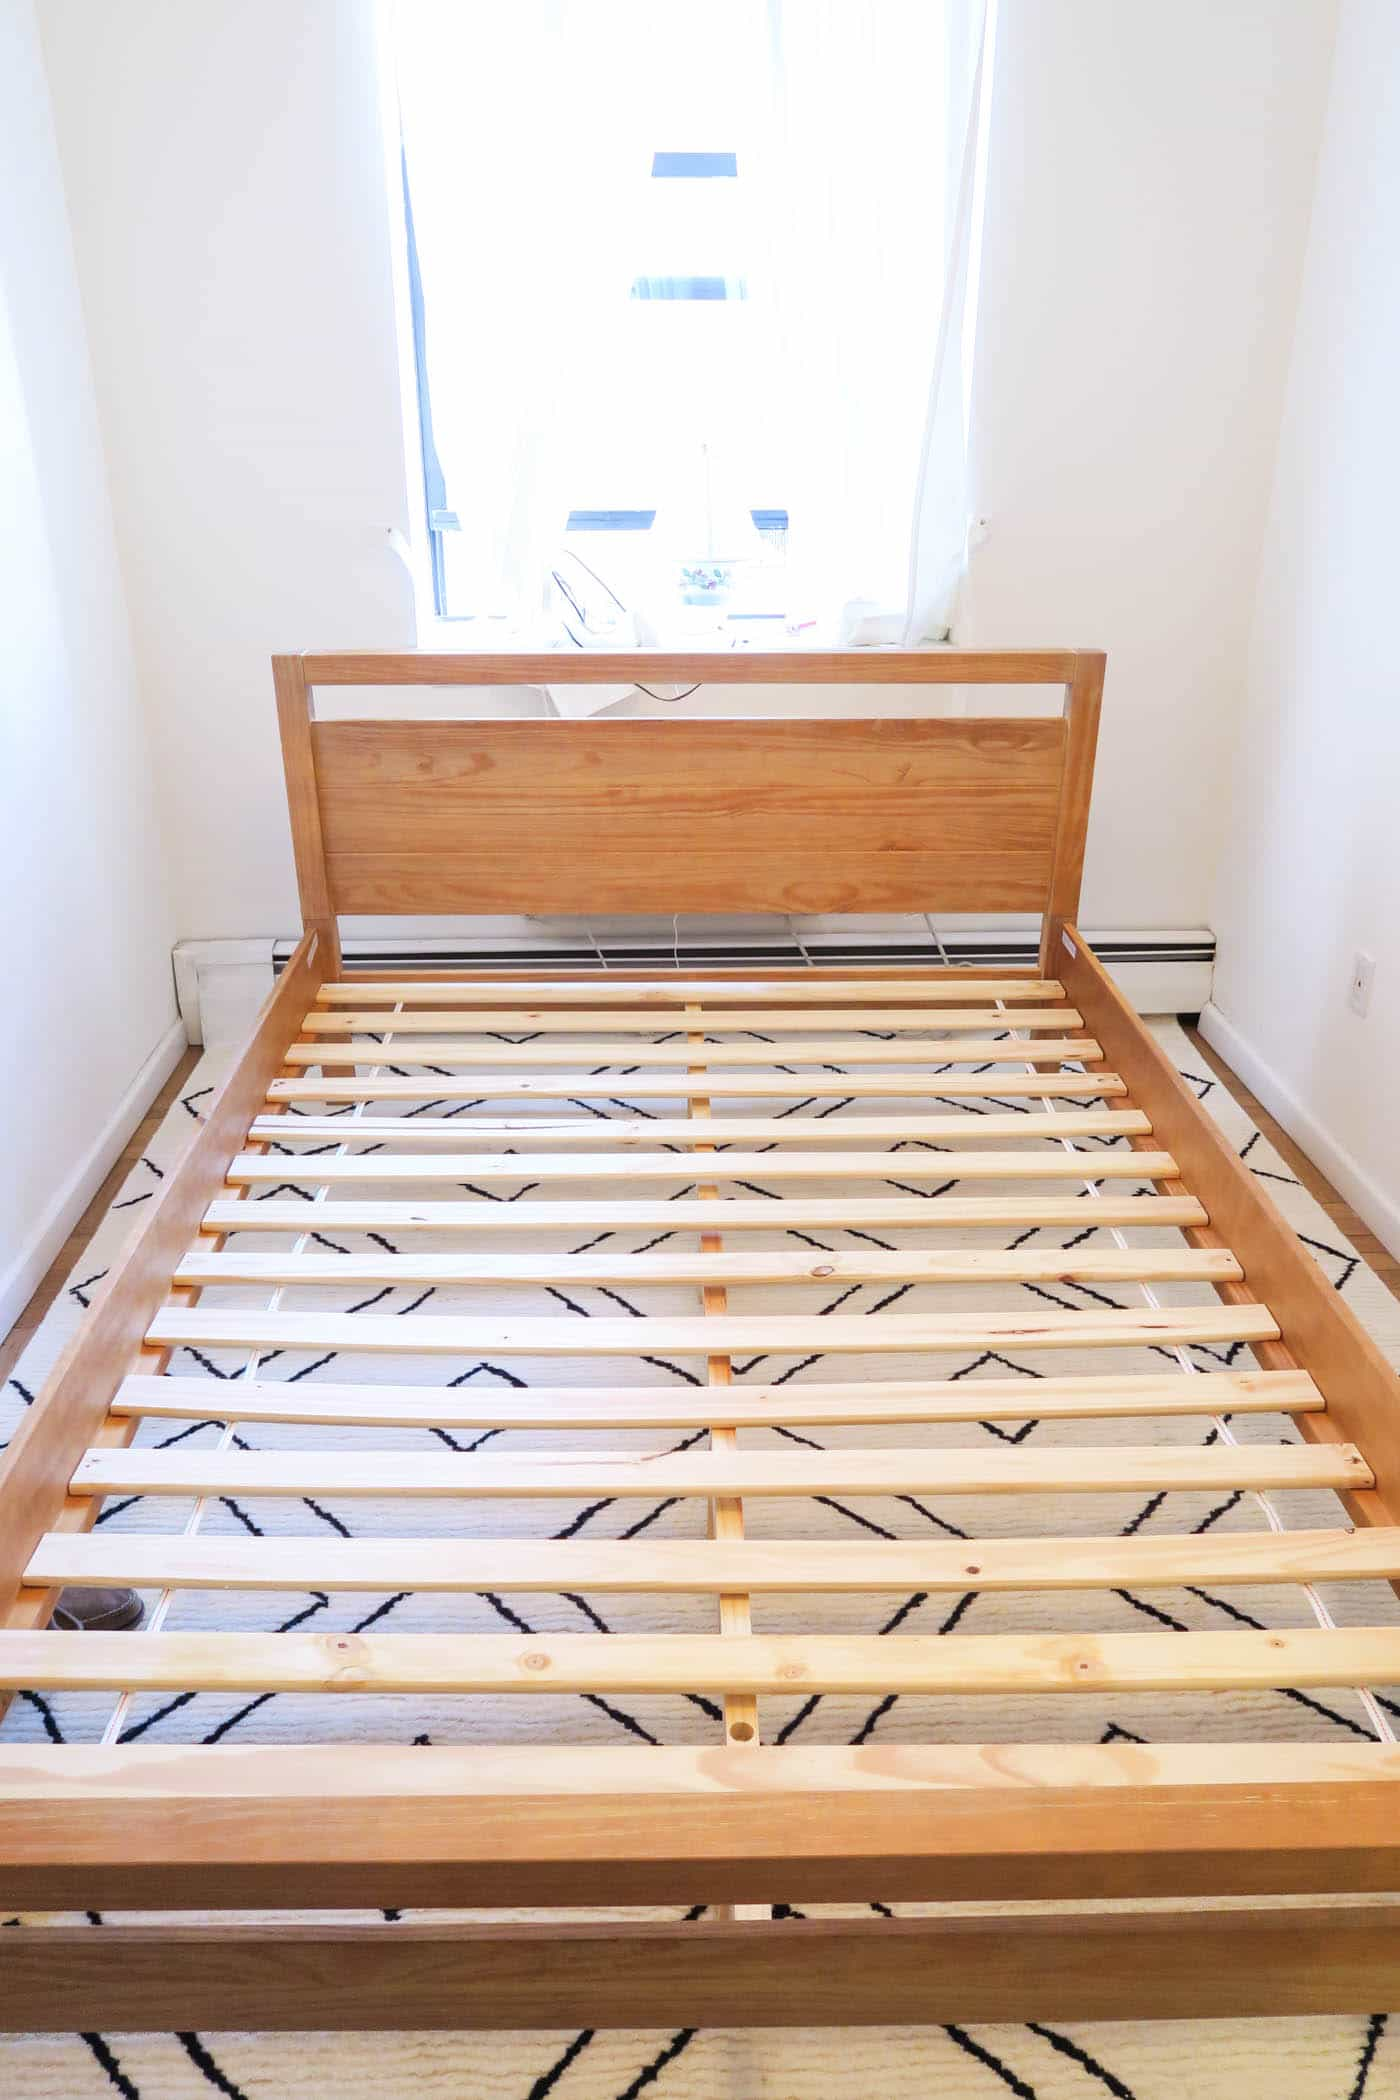 The Leandra Queen Platform bed from Joss & Main